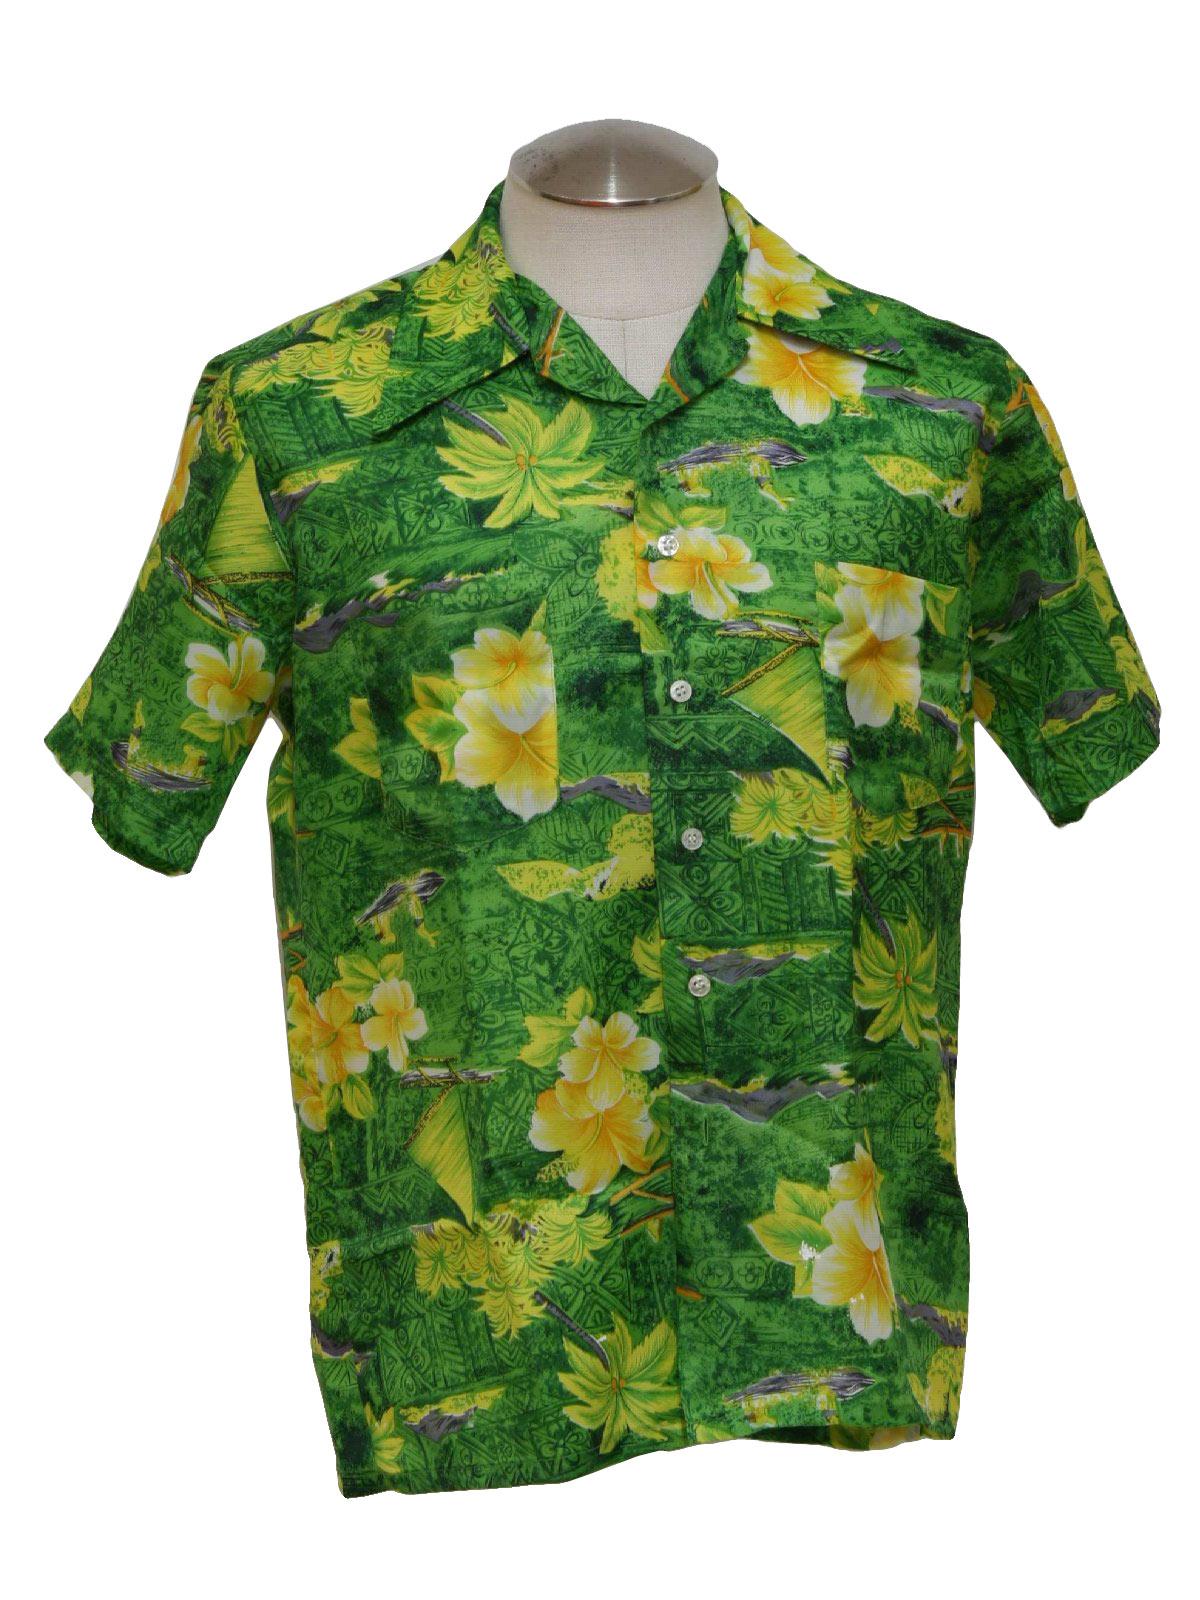 be728d88 Seventies Vintage Hawaiian Shirt: 70s -No Label but likely Waikiki ...